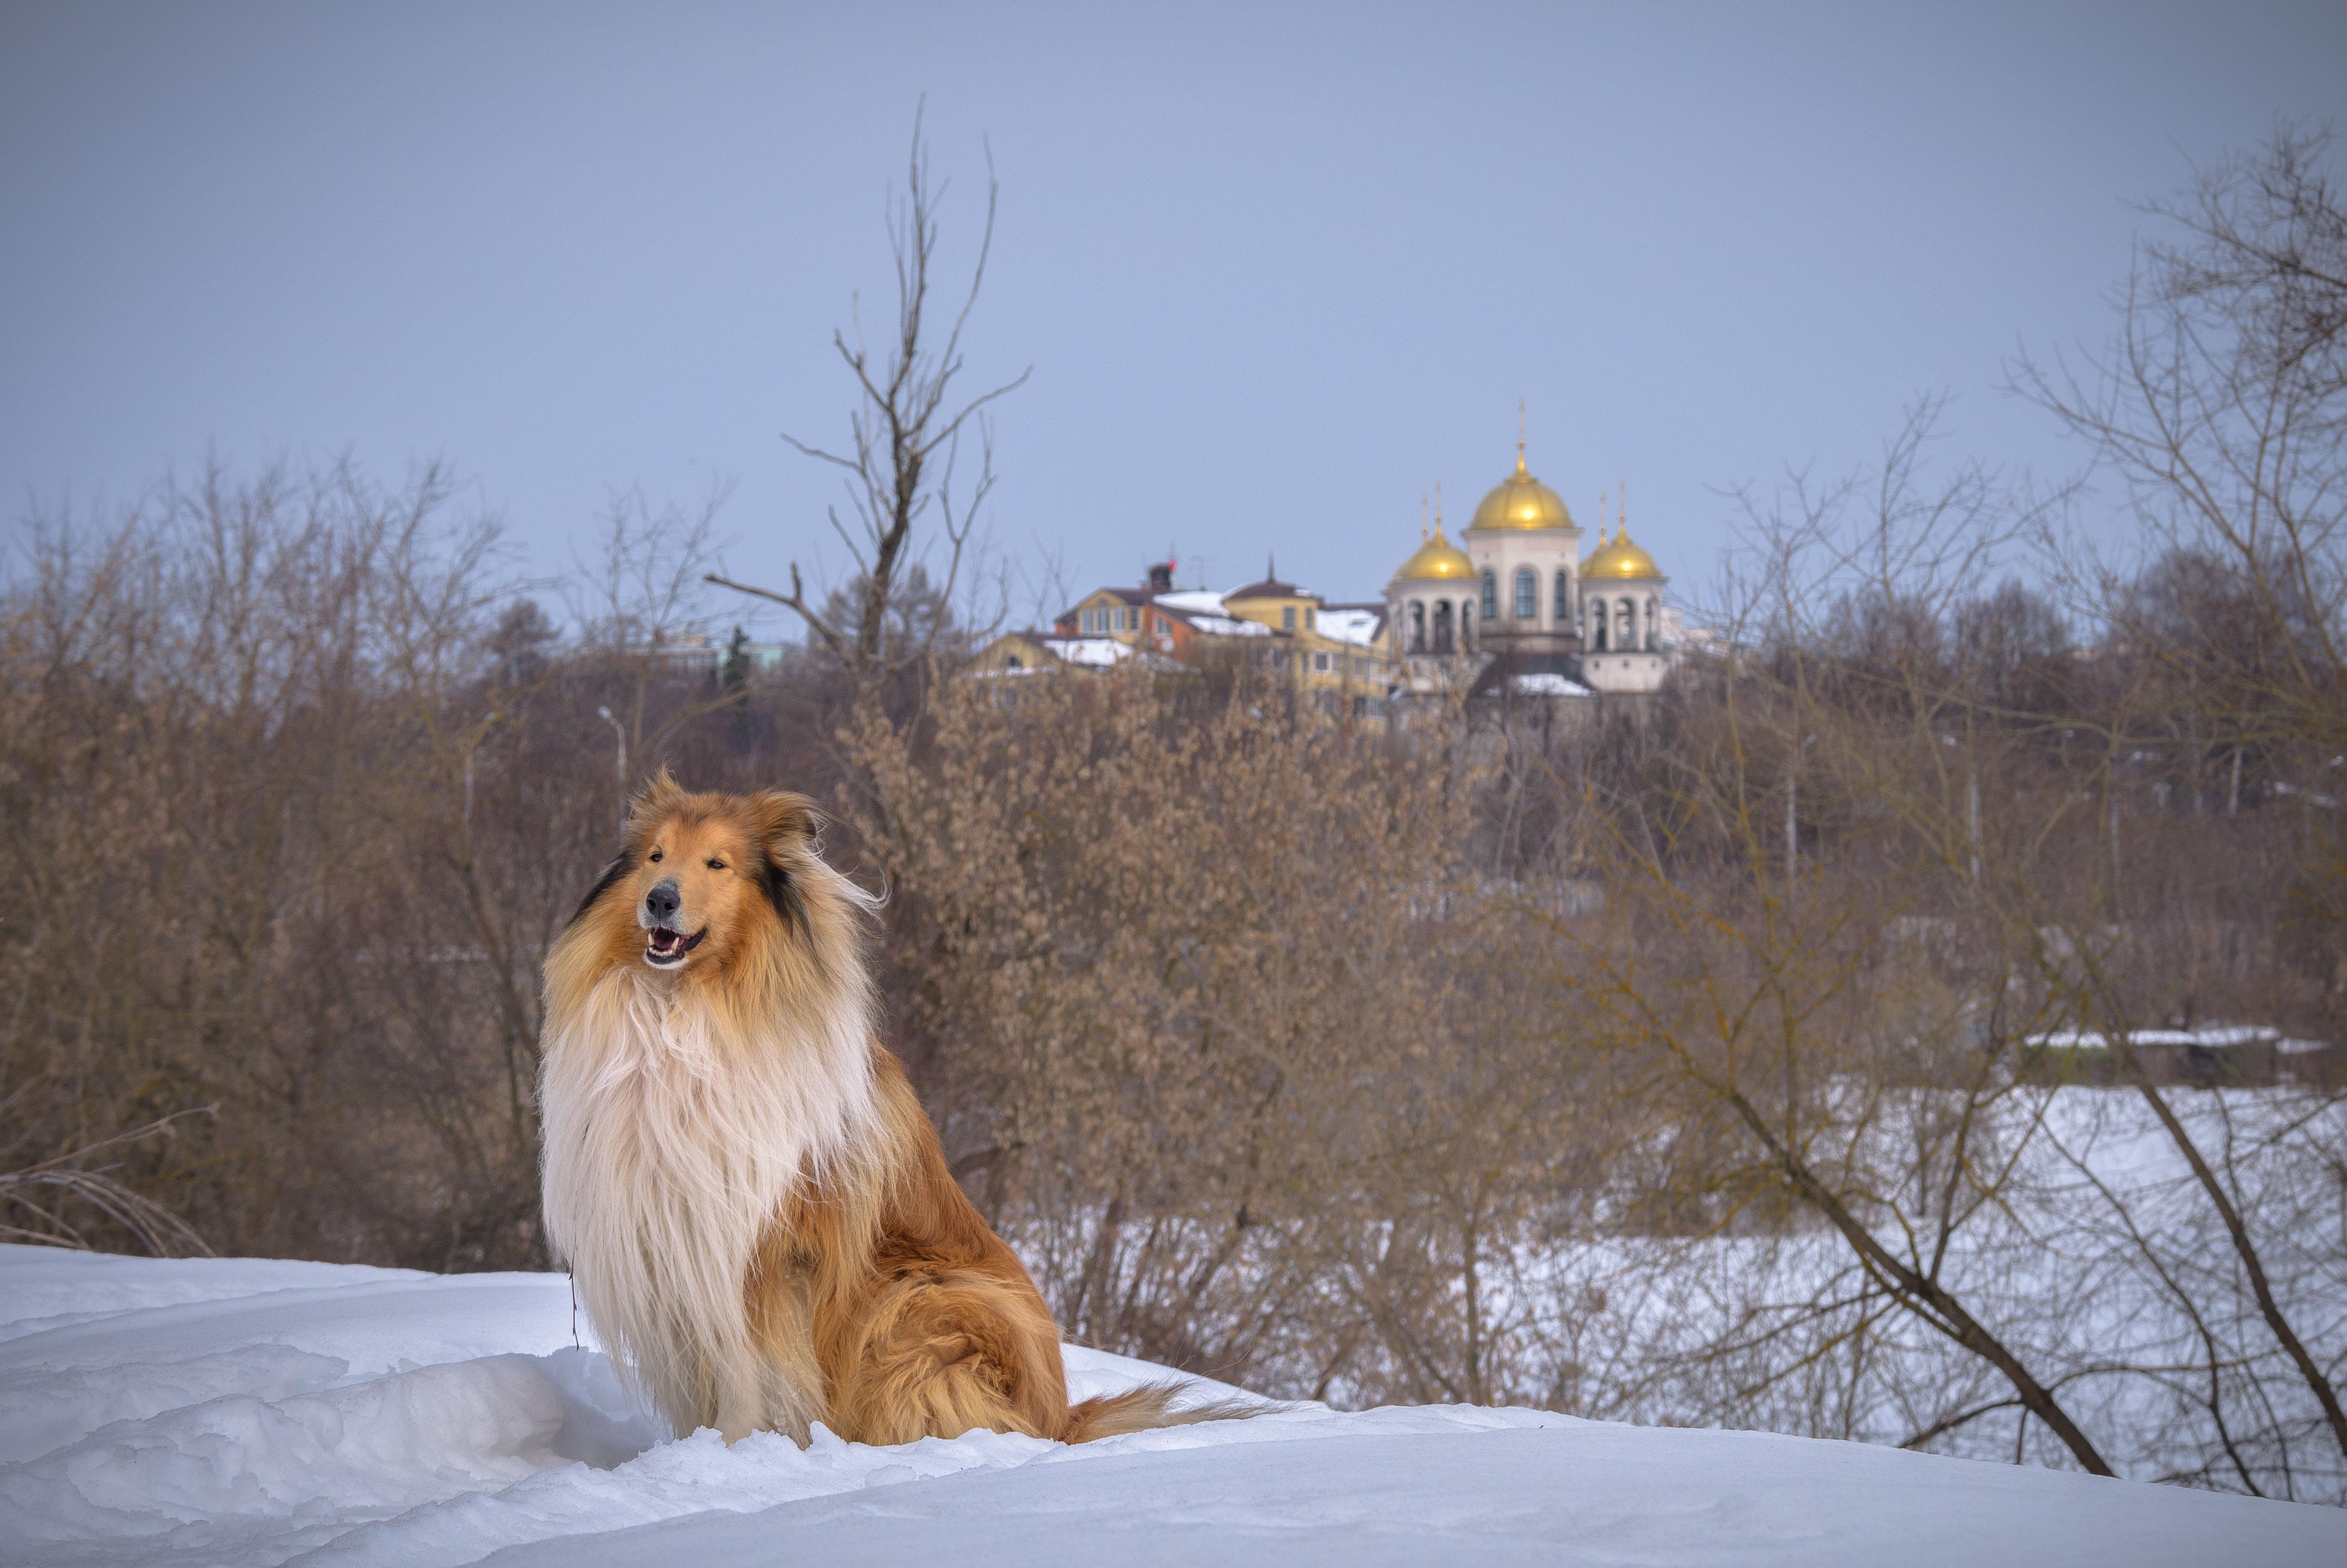 колли, звенигород, храм, купола, весенний пейзаж, март 2018, снег, москва река, Соварцева Ксения